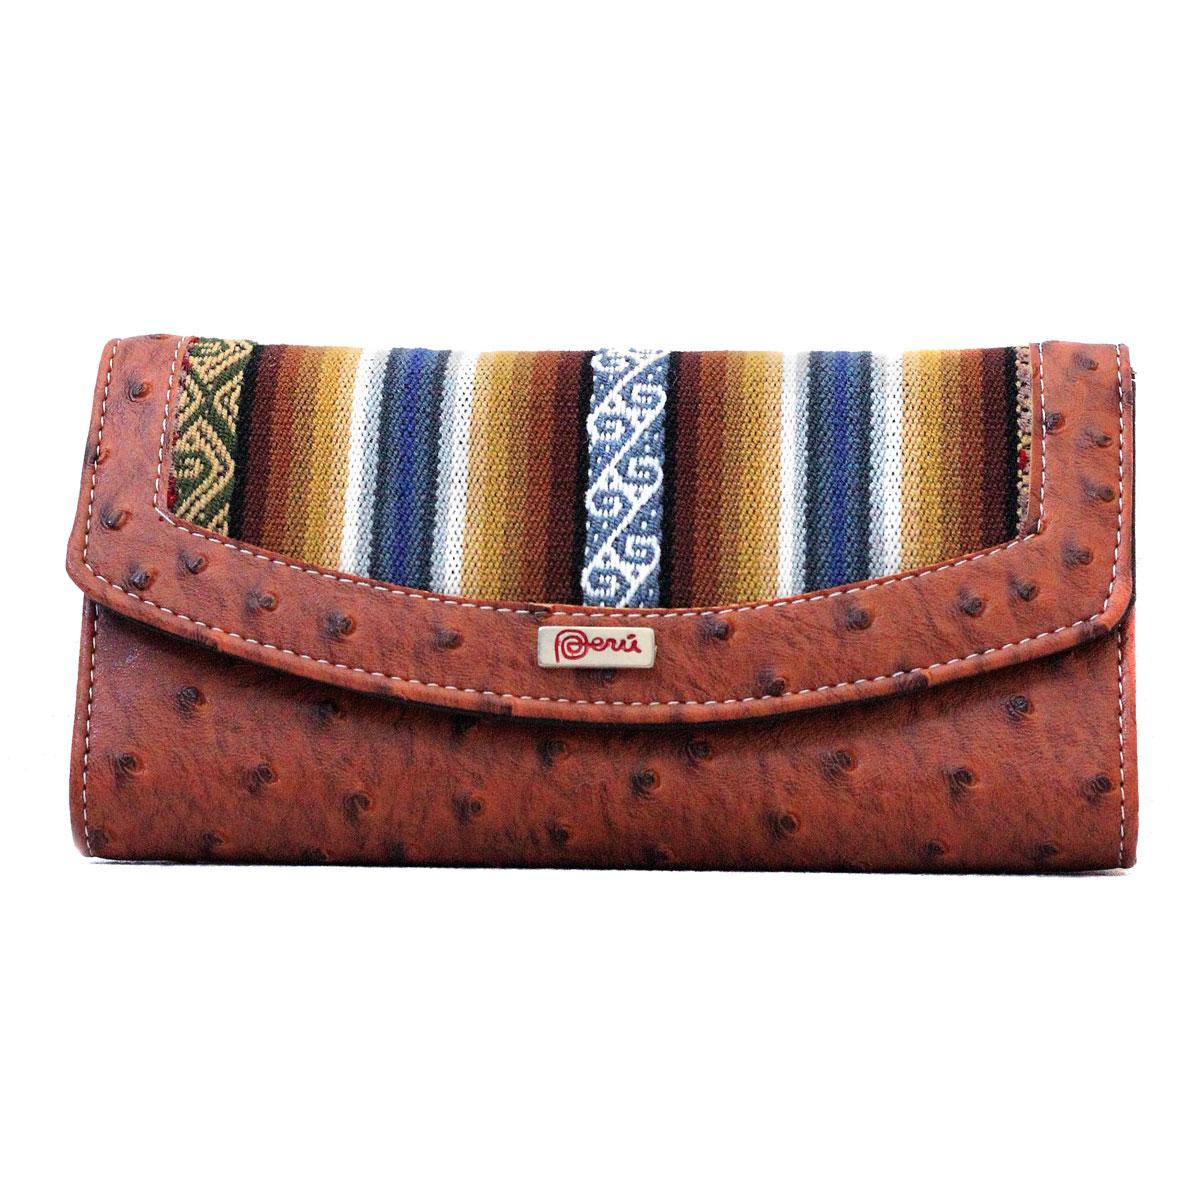 Inka-Products-Portefeuille péruvien PACHA-Marron Blue Ethnique